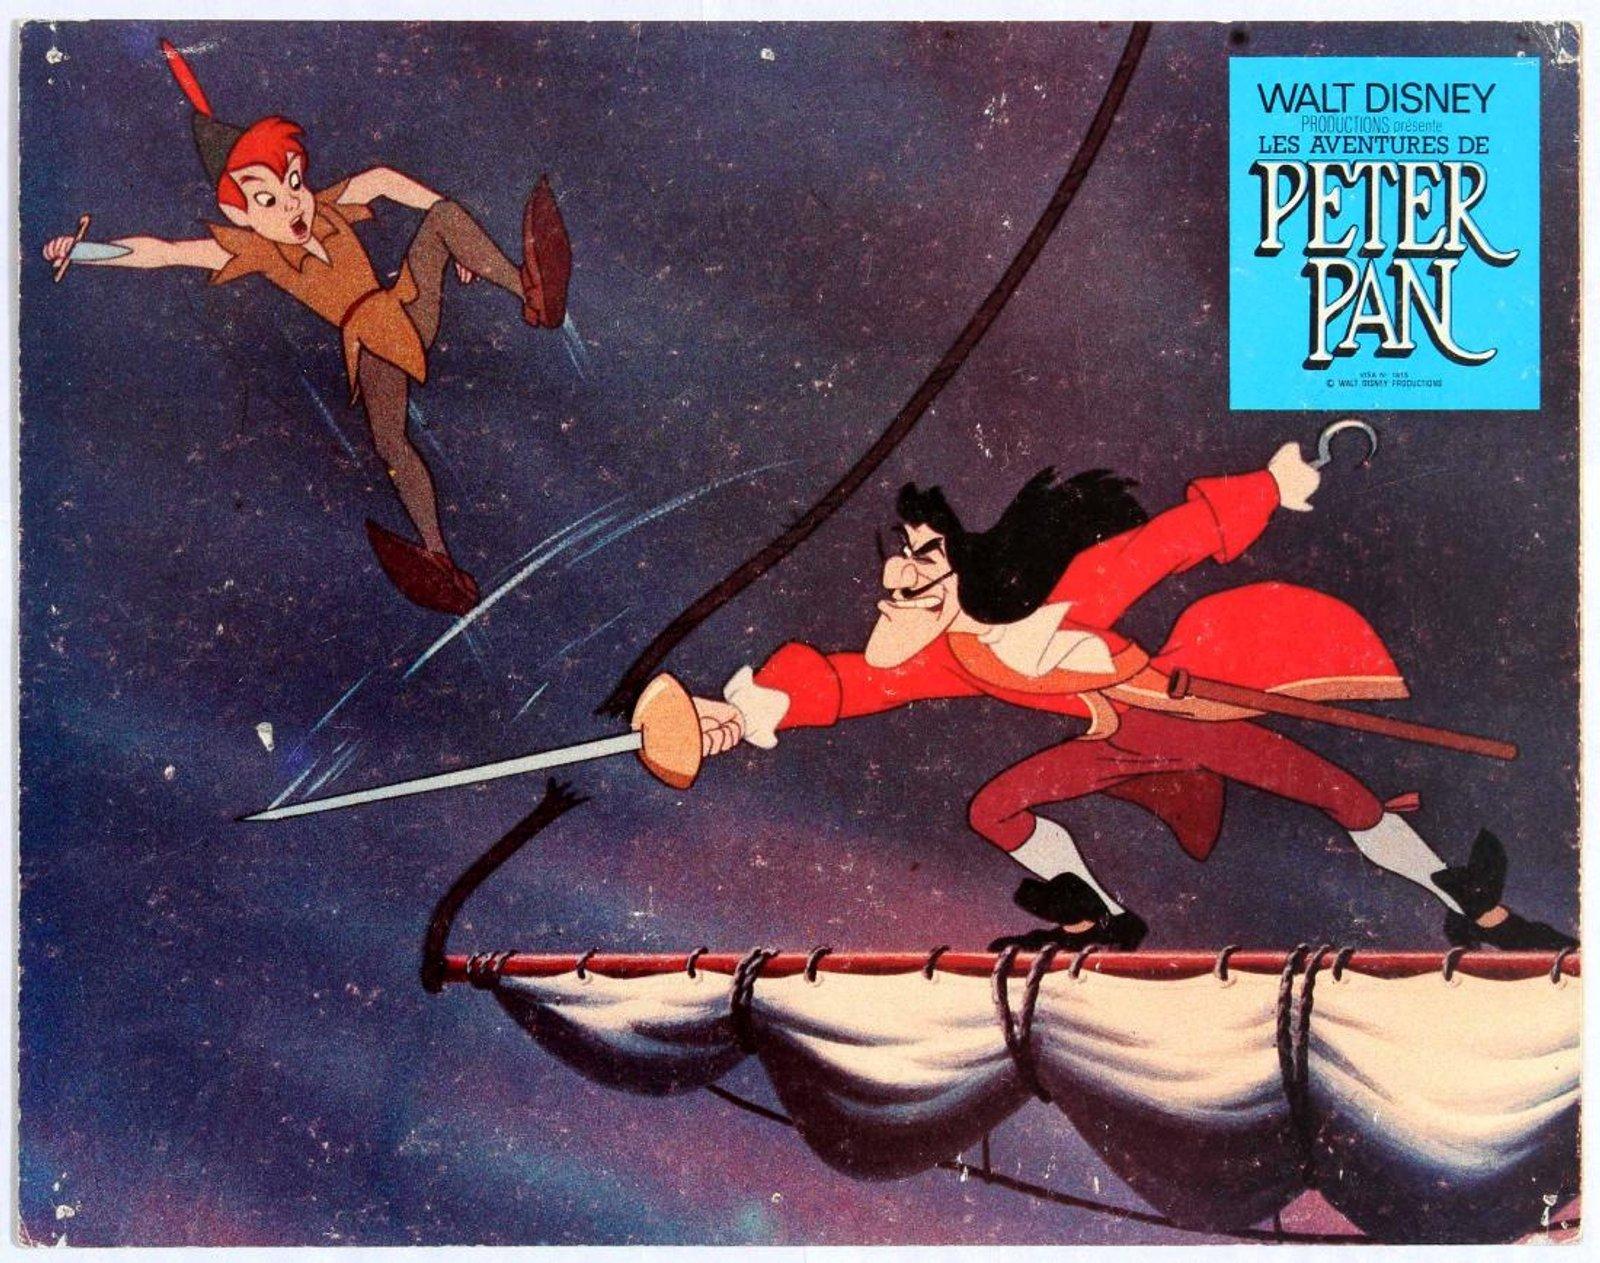 c Walt Disney Peter Pan